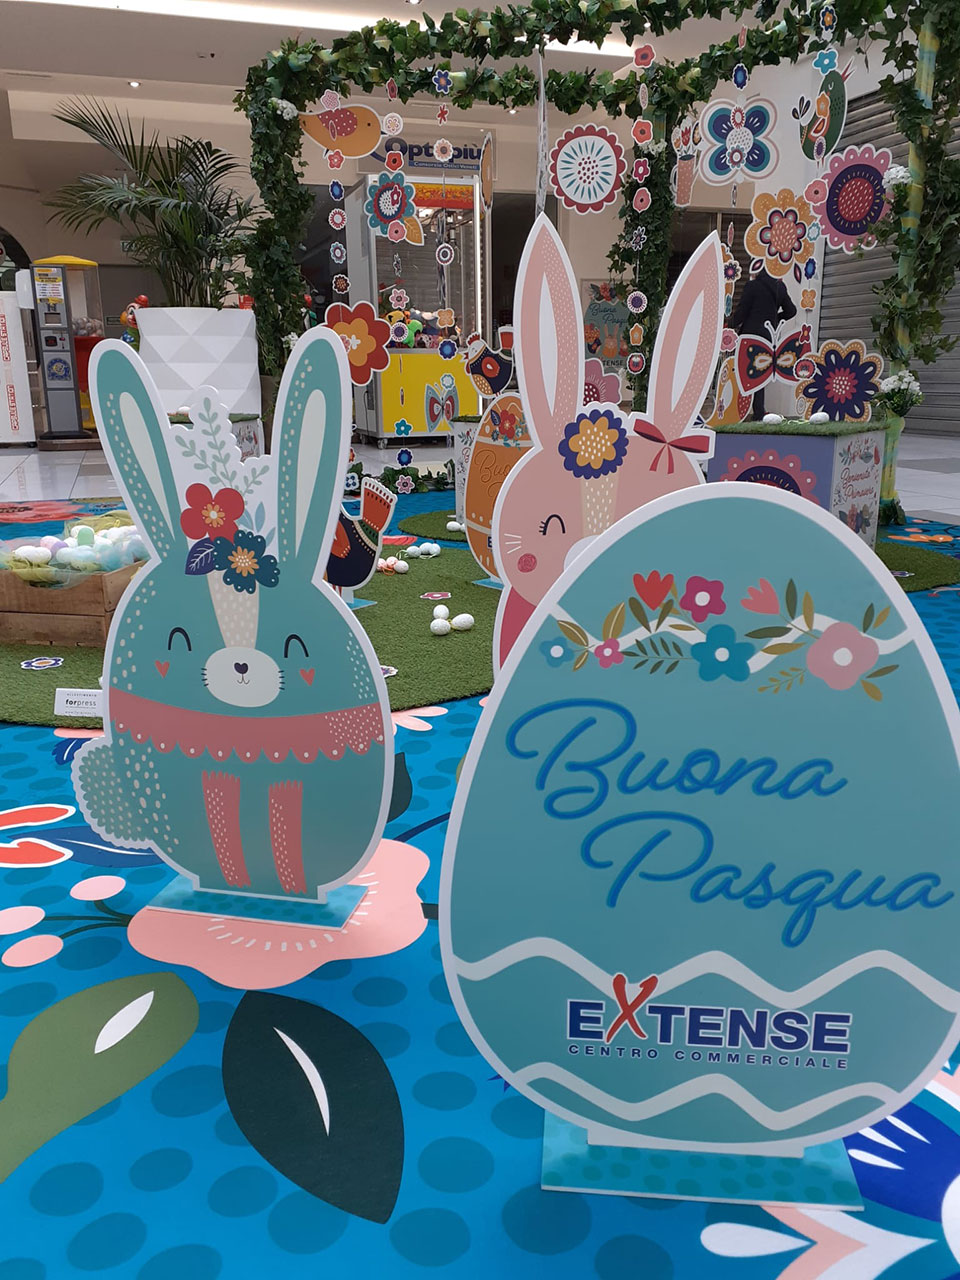 Pasqua 2021 - Centro Commerciale Extense